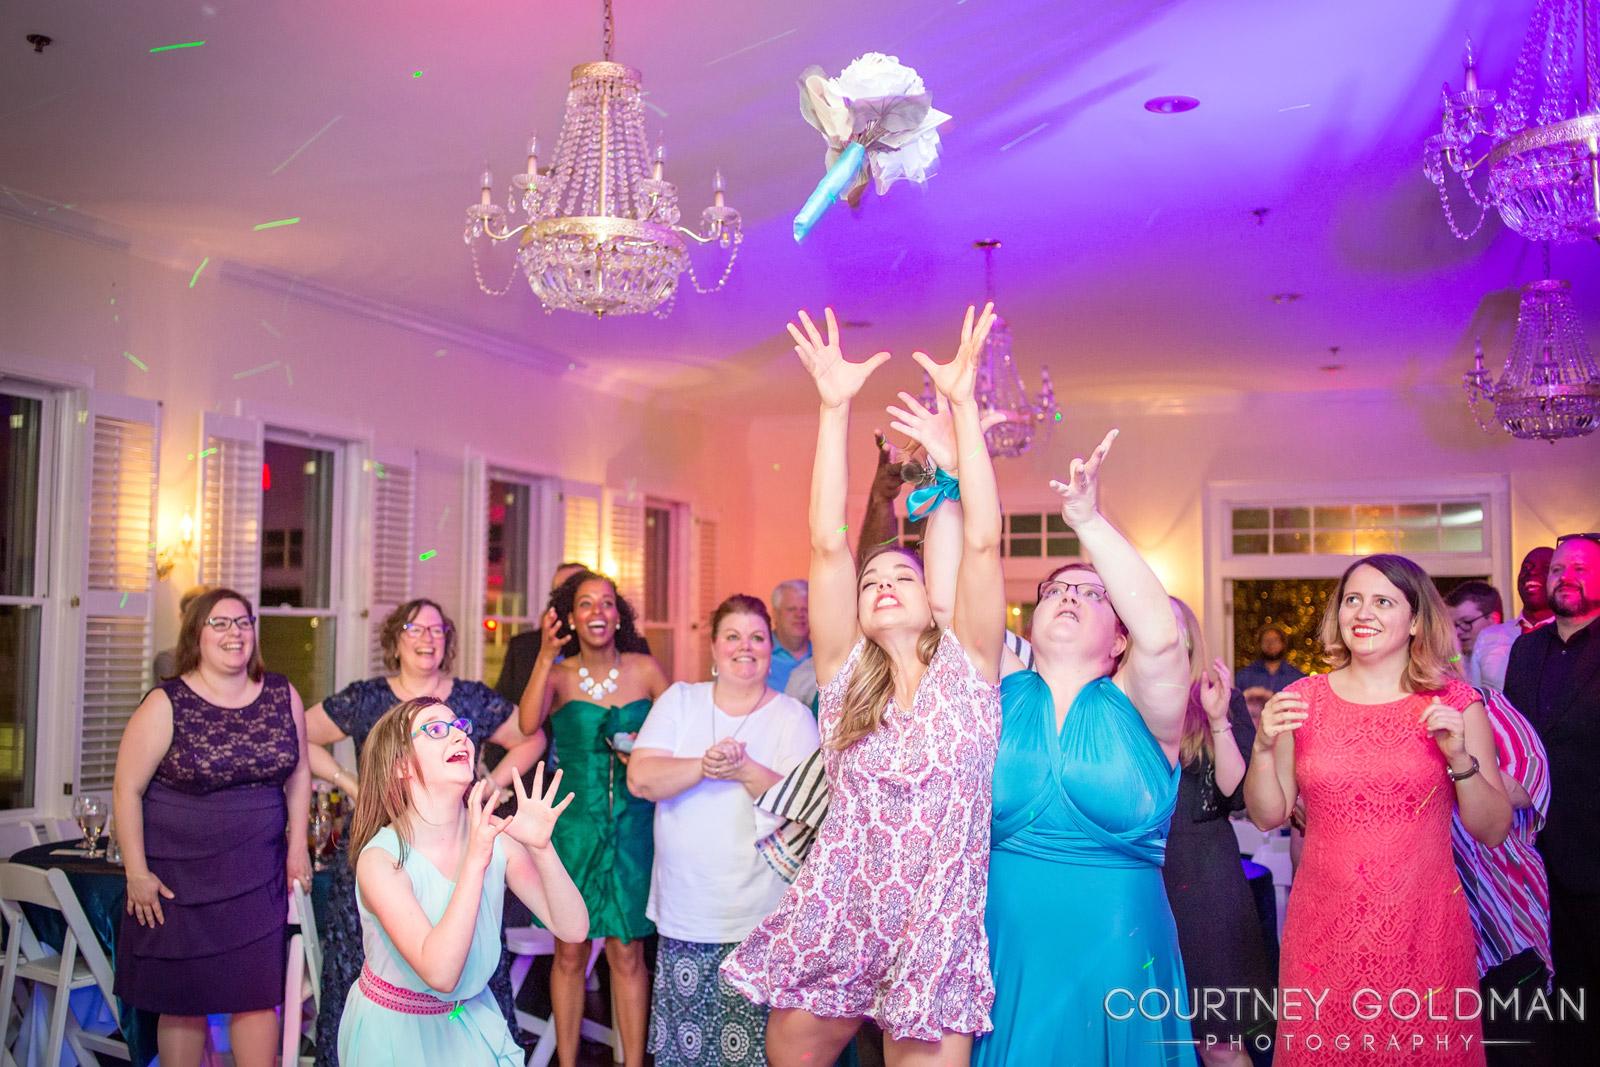 Atlanta-Wedding-Photography-by-Courtney-Goldman-64.jpg